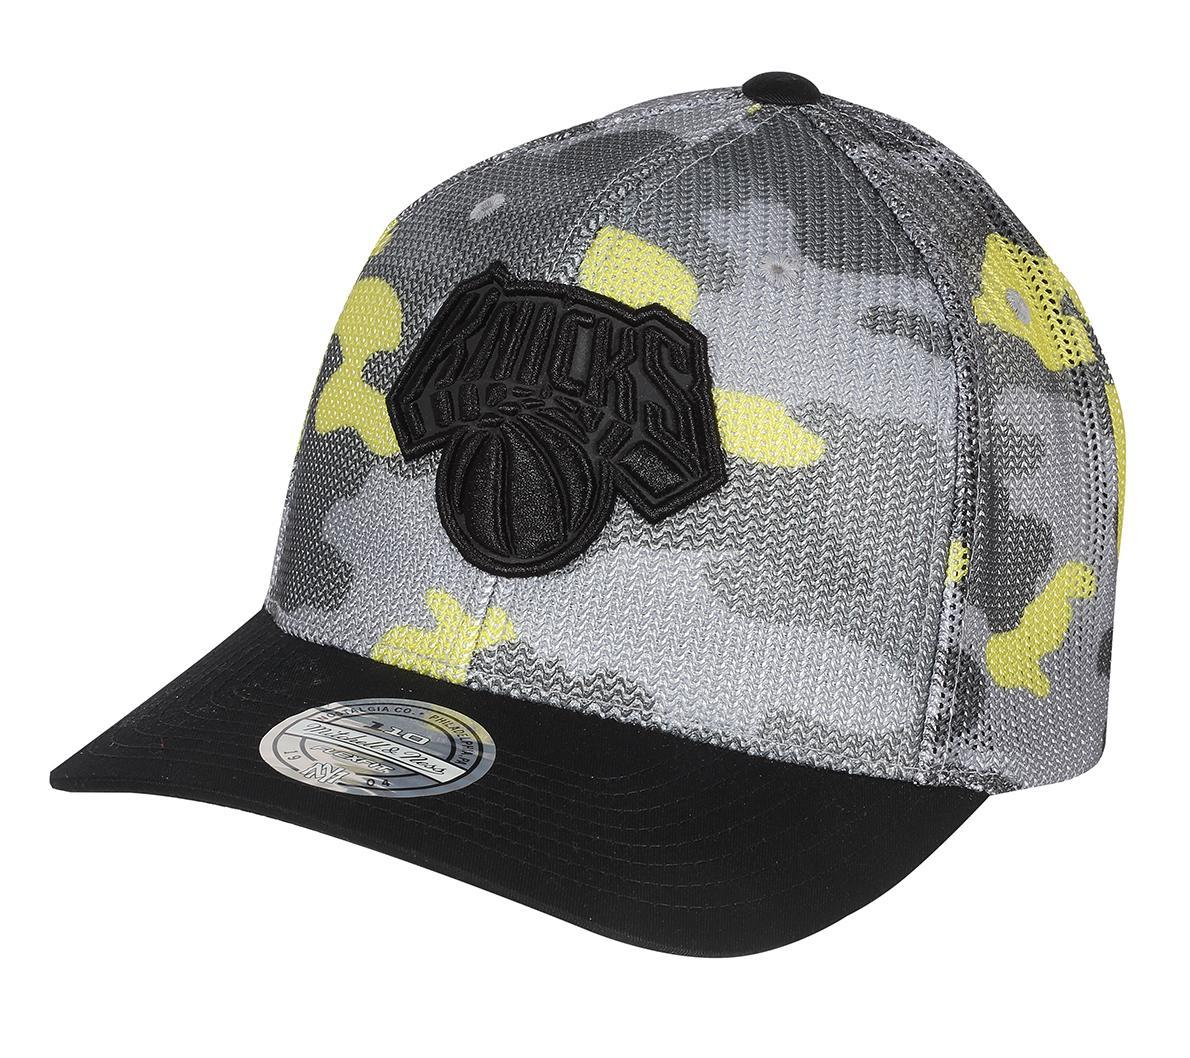 new products 919dc 703dd Flou Camo 110 Snapback New York Knicks £12.50 £25.00